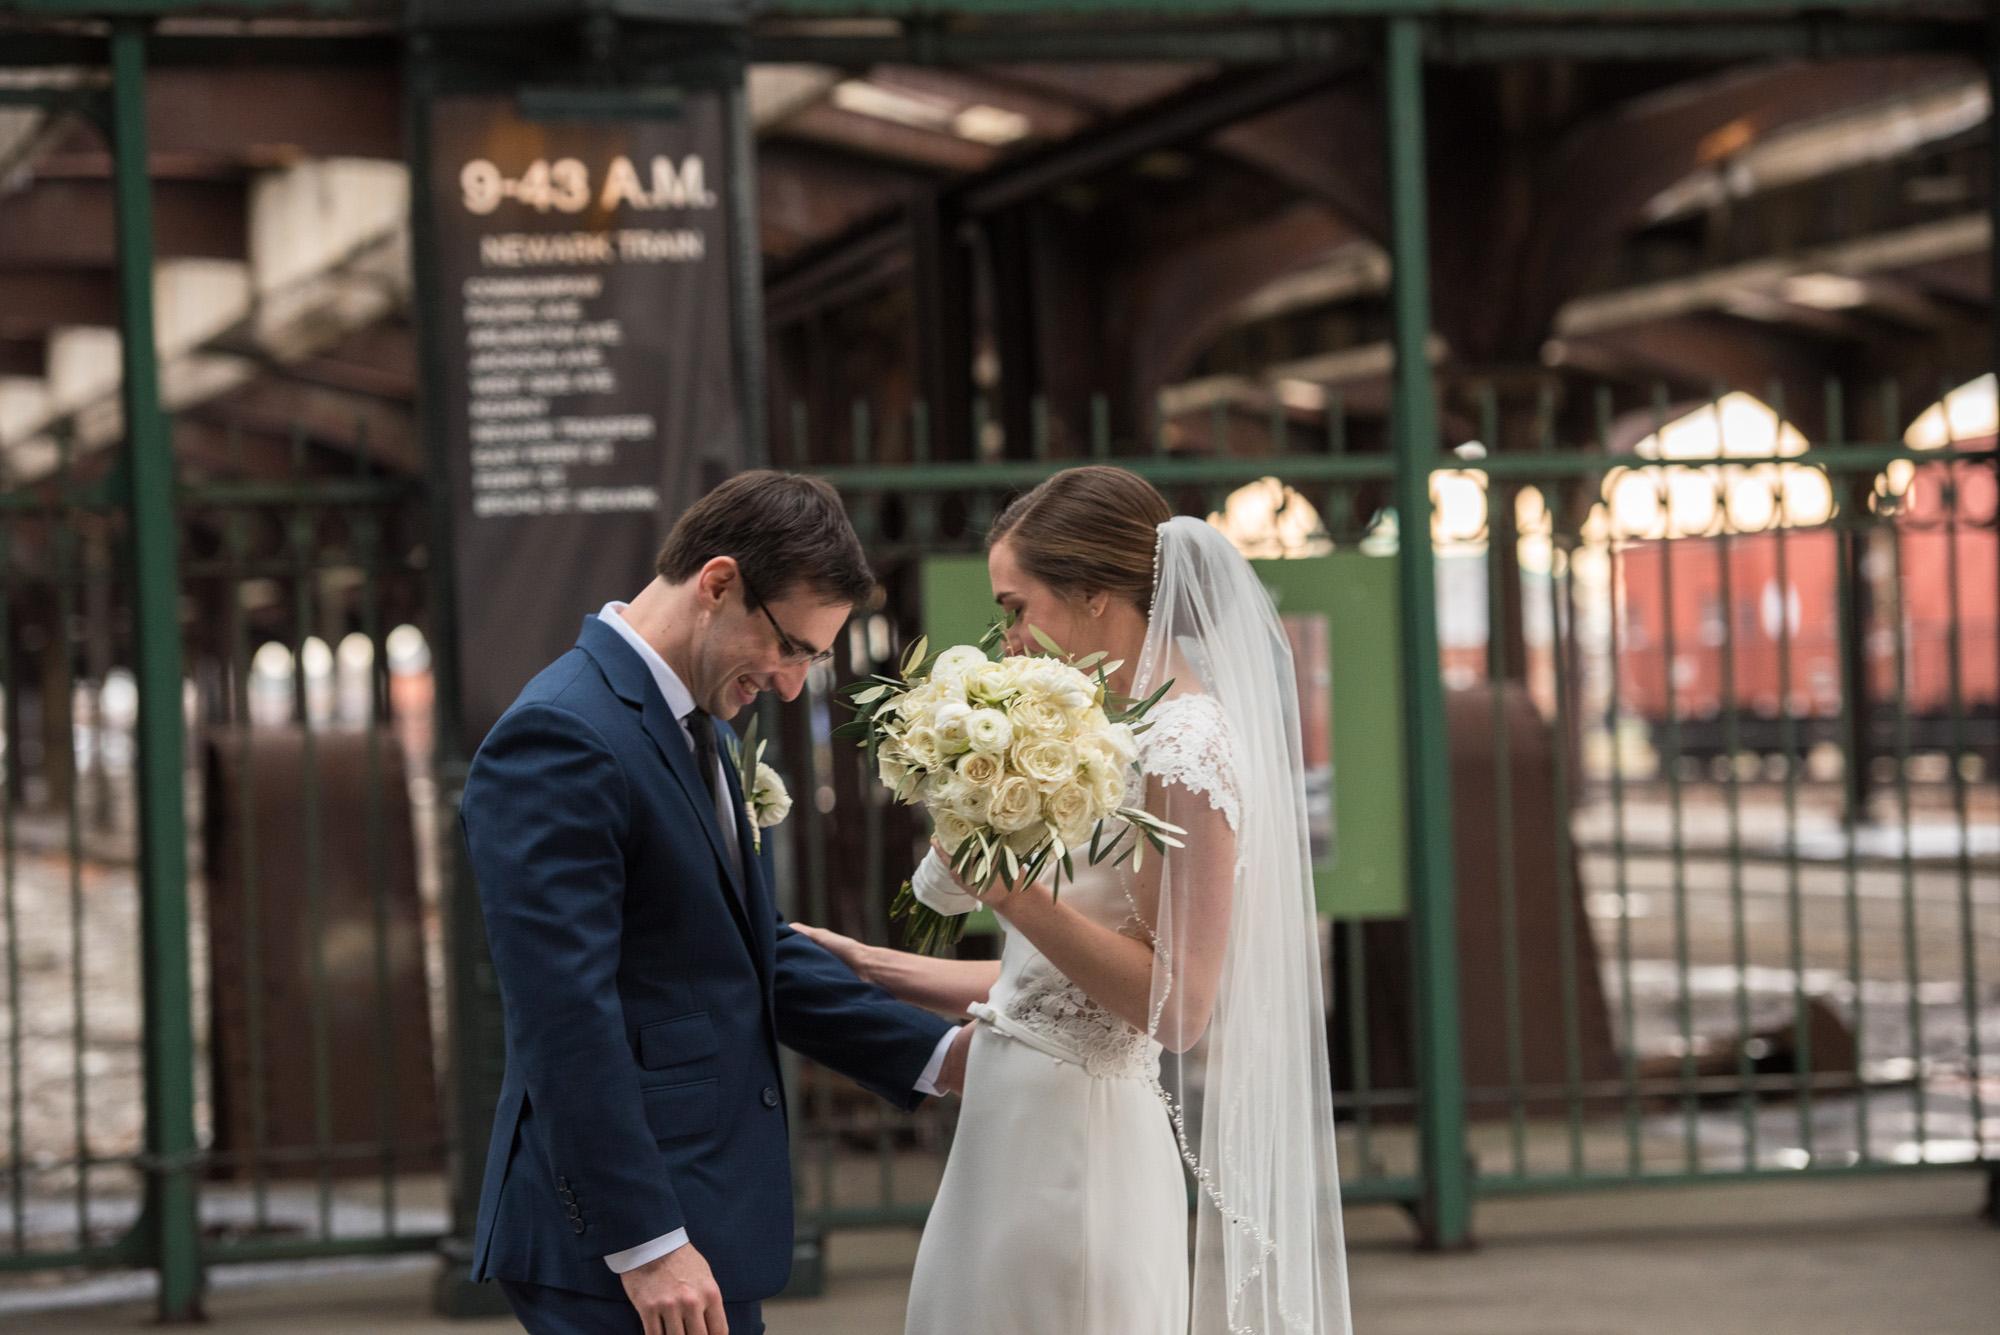 nj-wedding-photographer-maritime-parc-maria-david-19.jpg